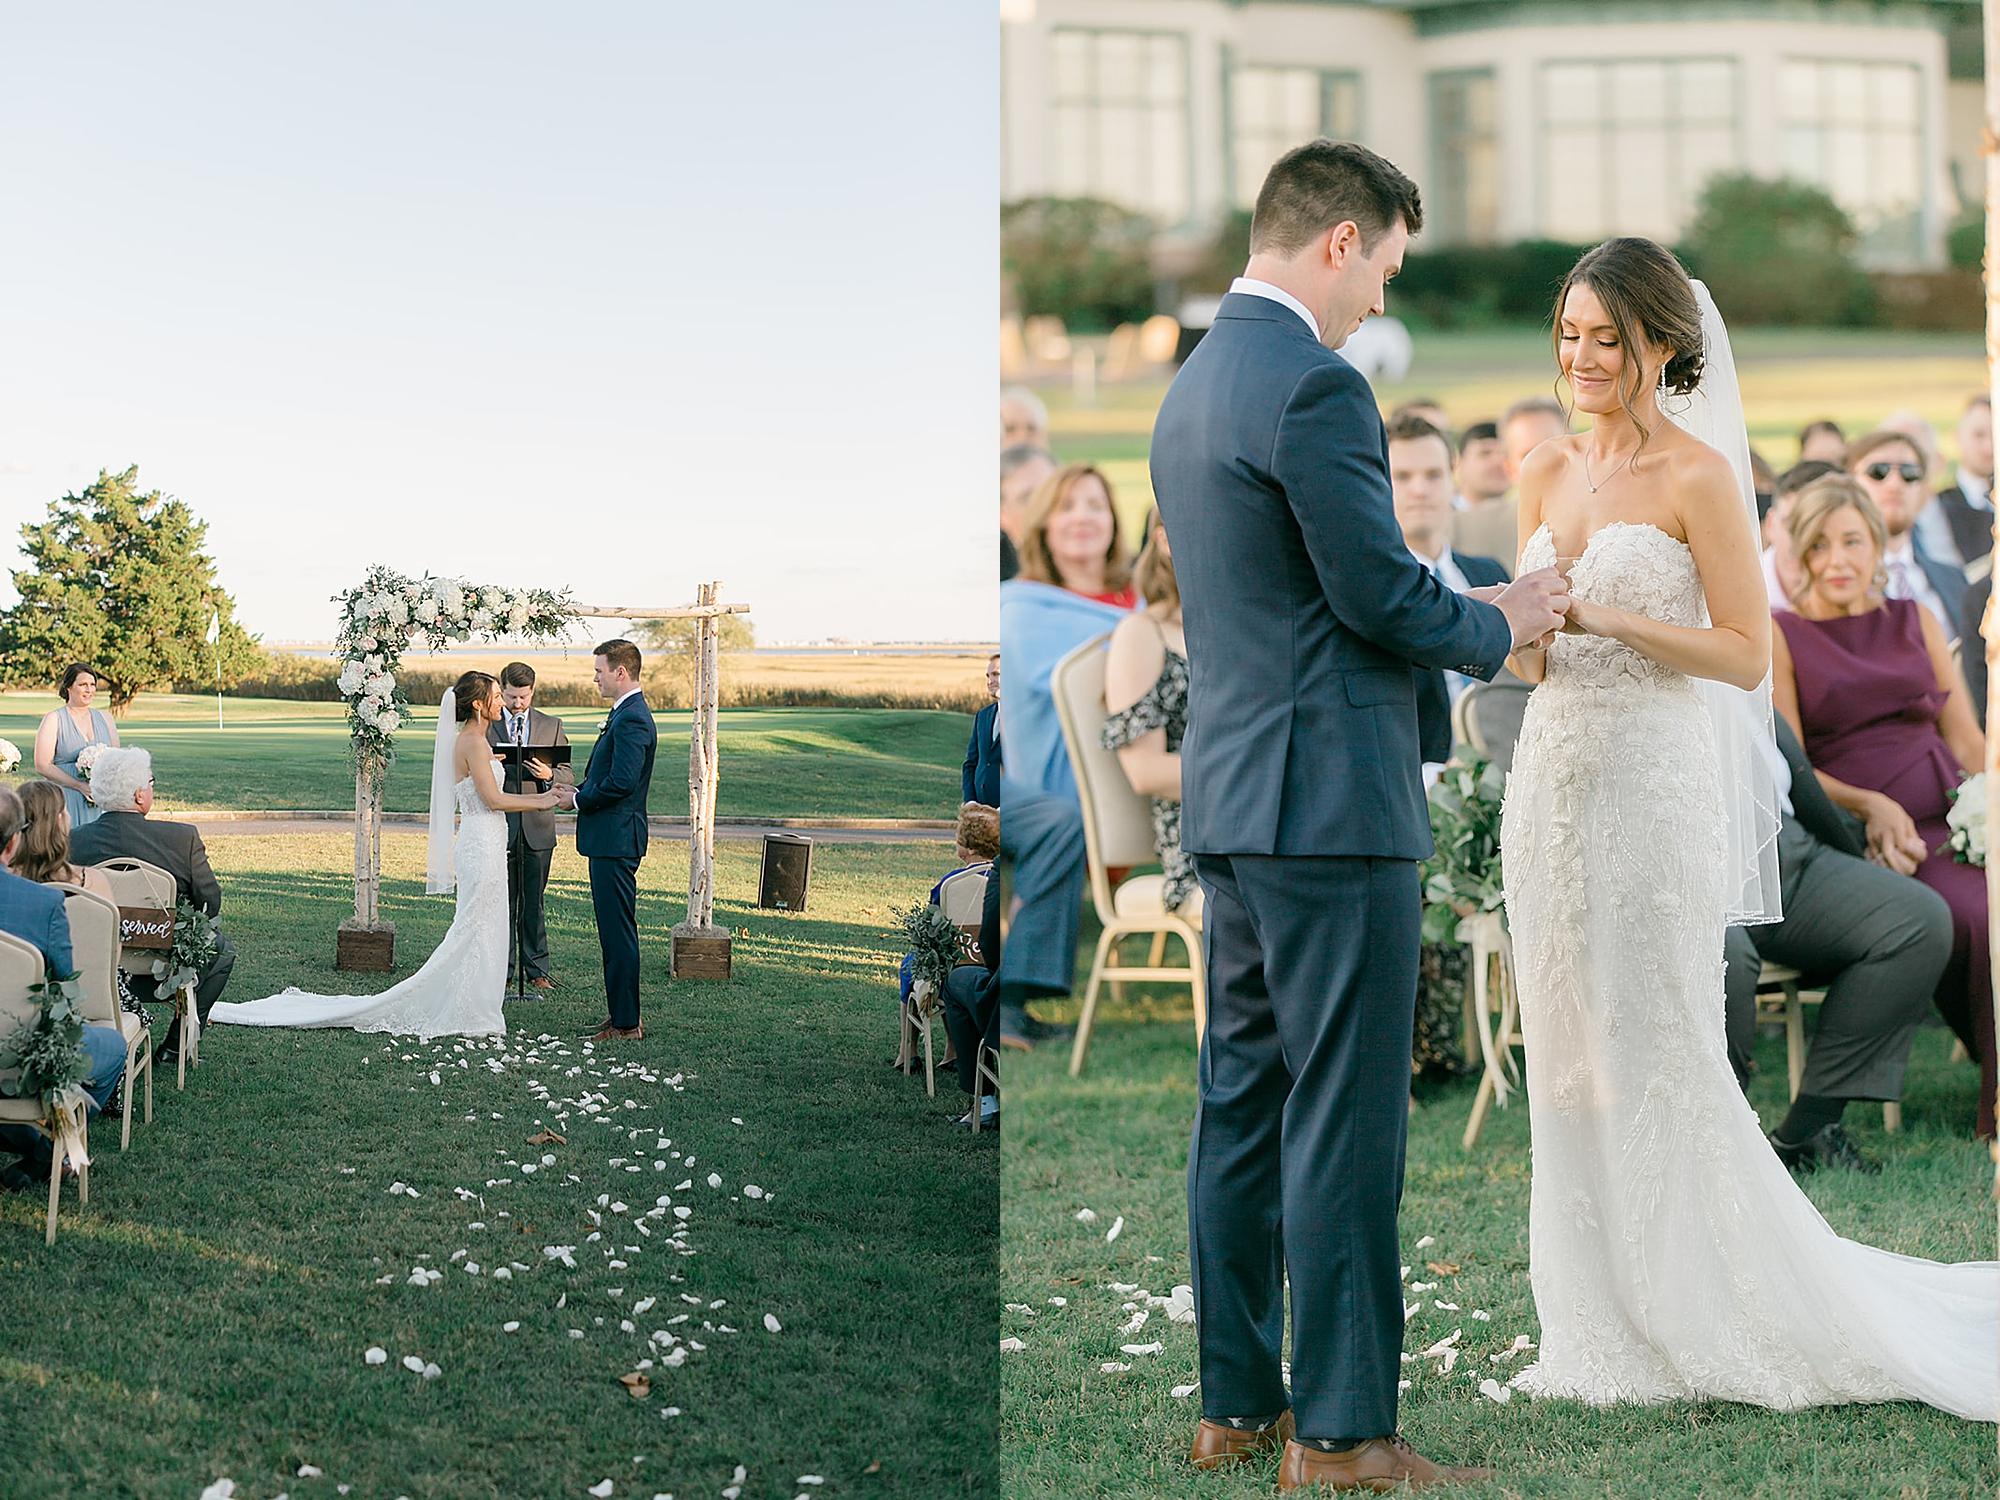 Linwood Country Club Wedding Photography by Magdalena Studios KatieTom0041